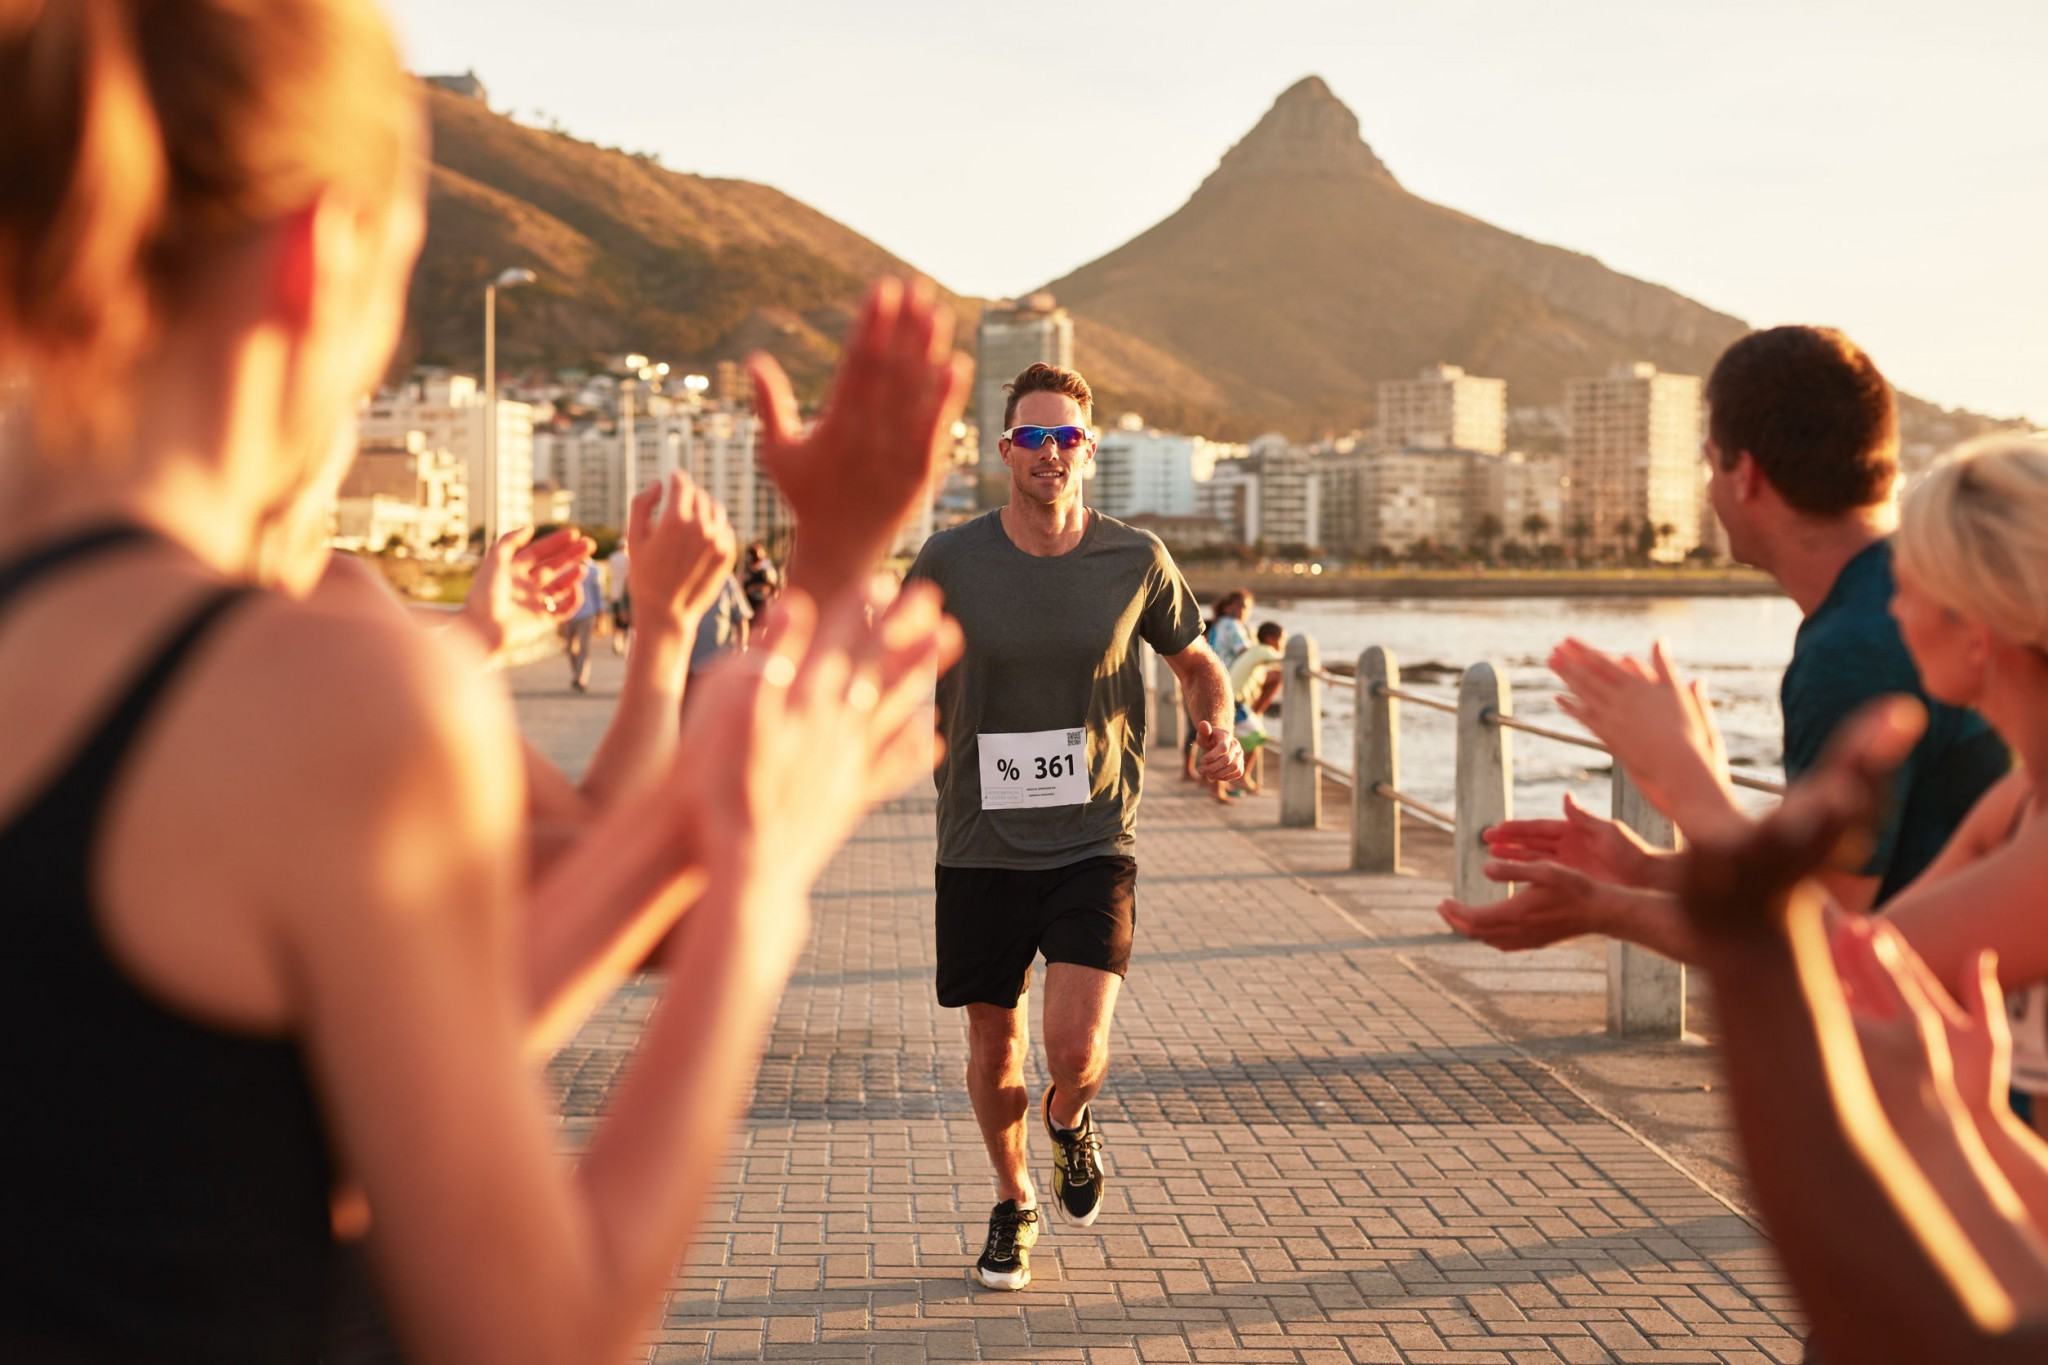 runner approaching finish line